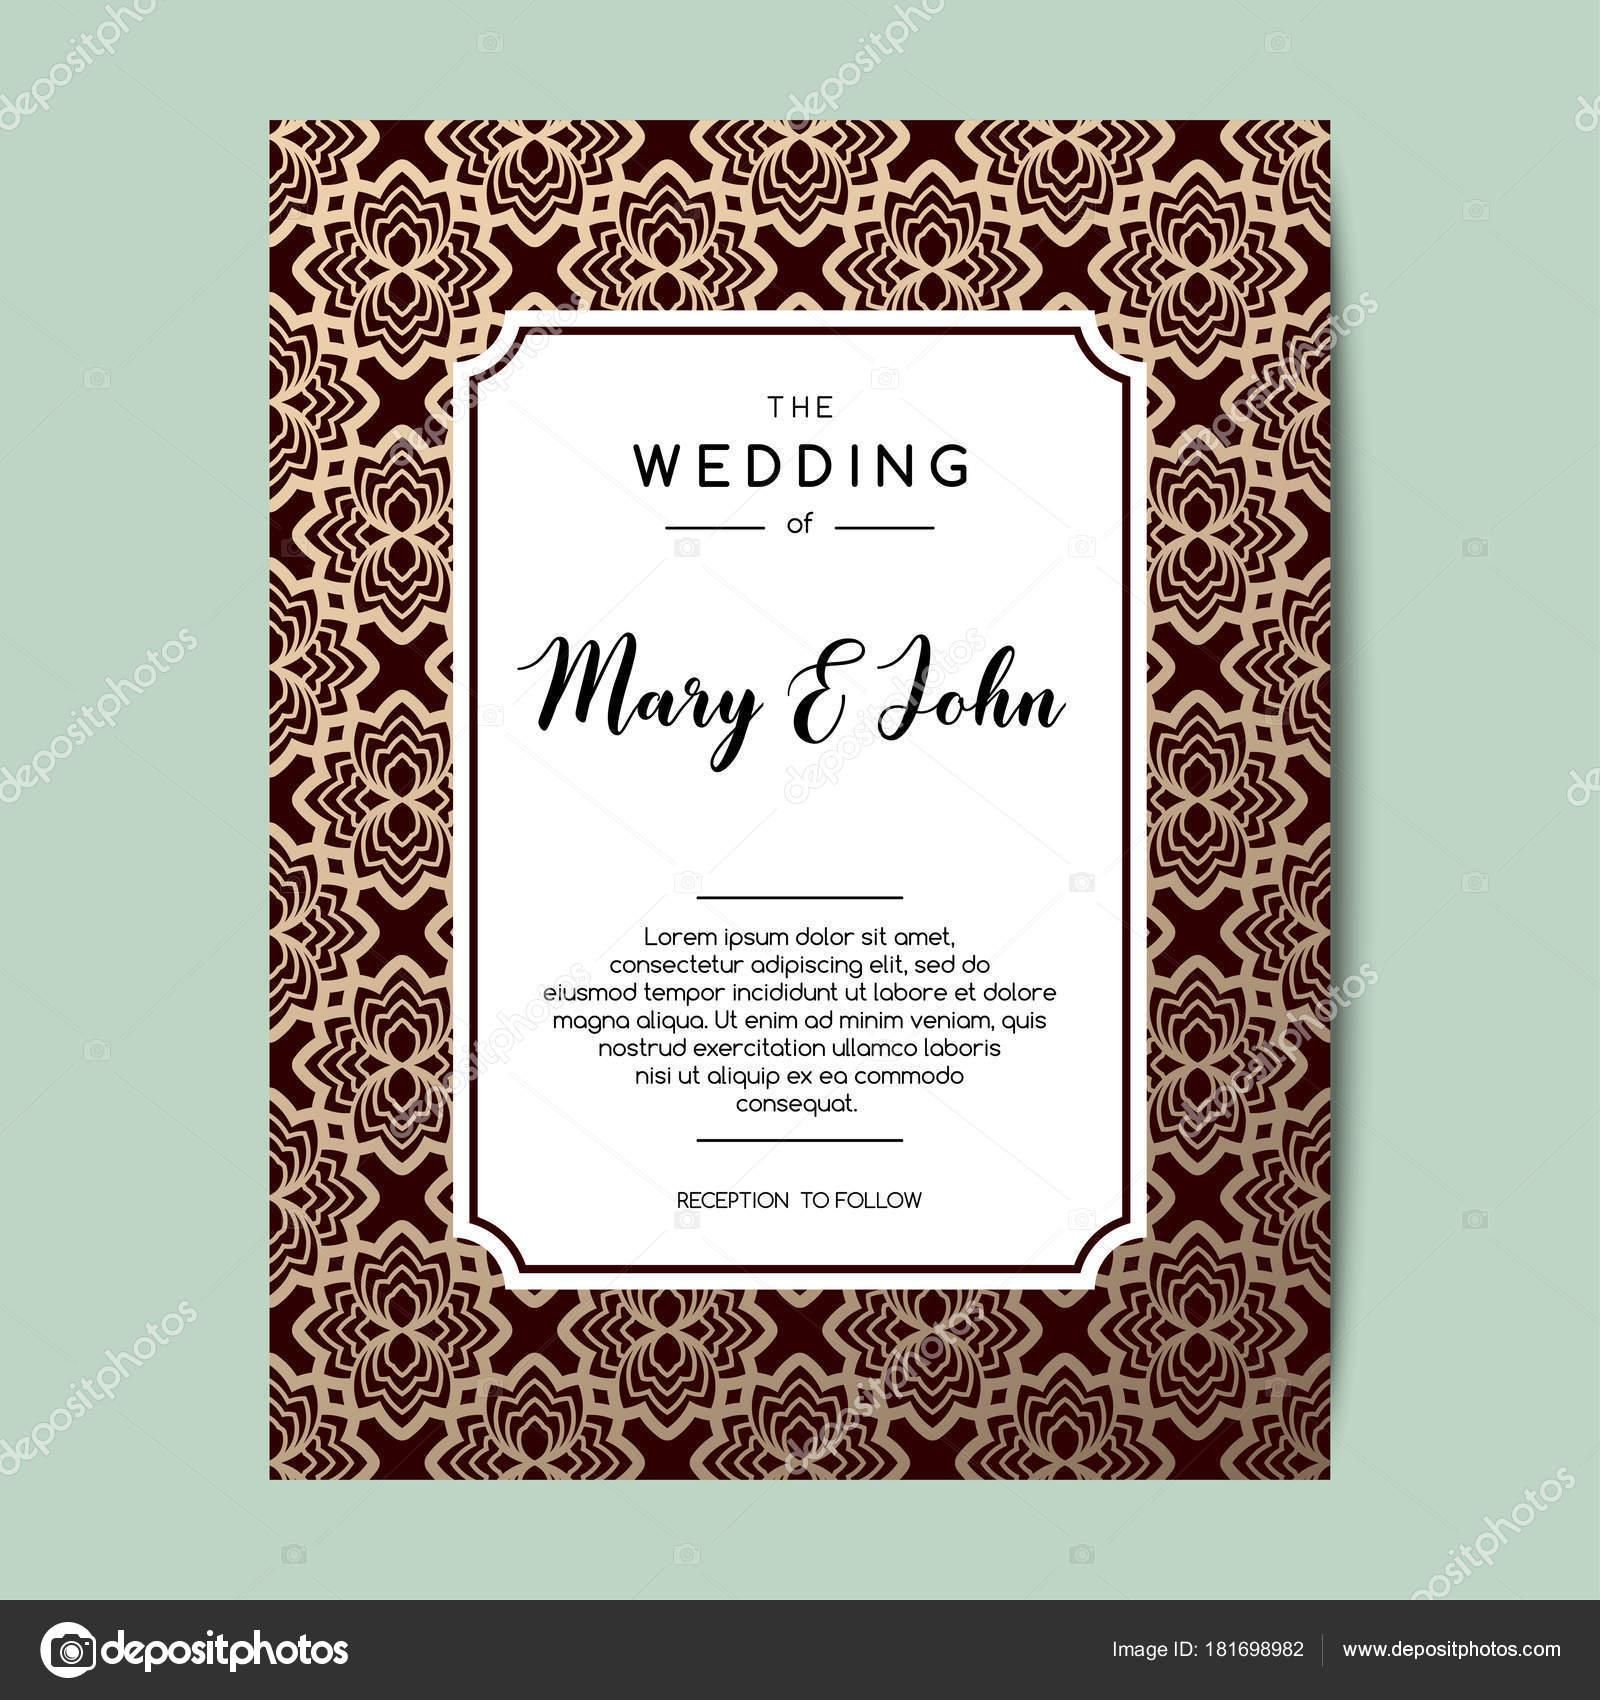 Elegant wedding invitation background. Card design with floral ...